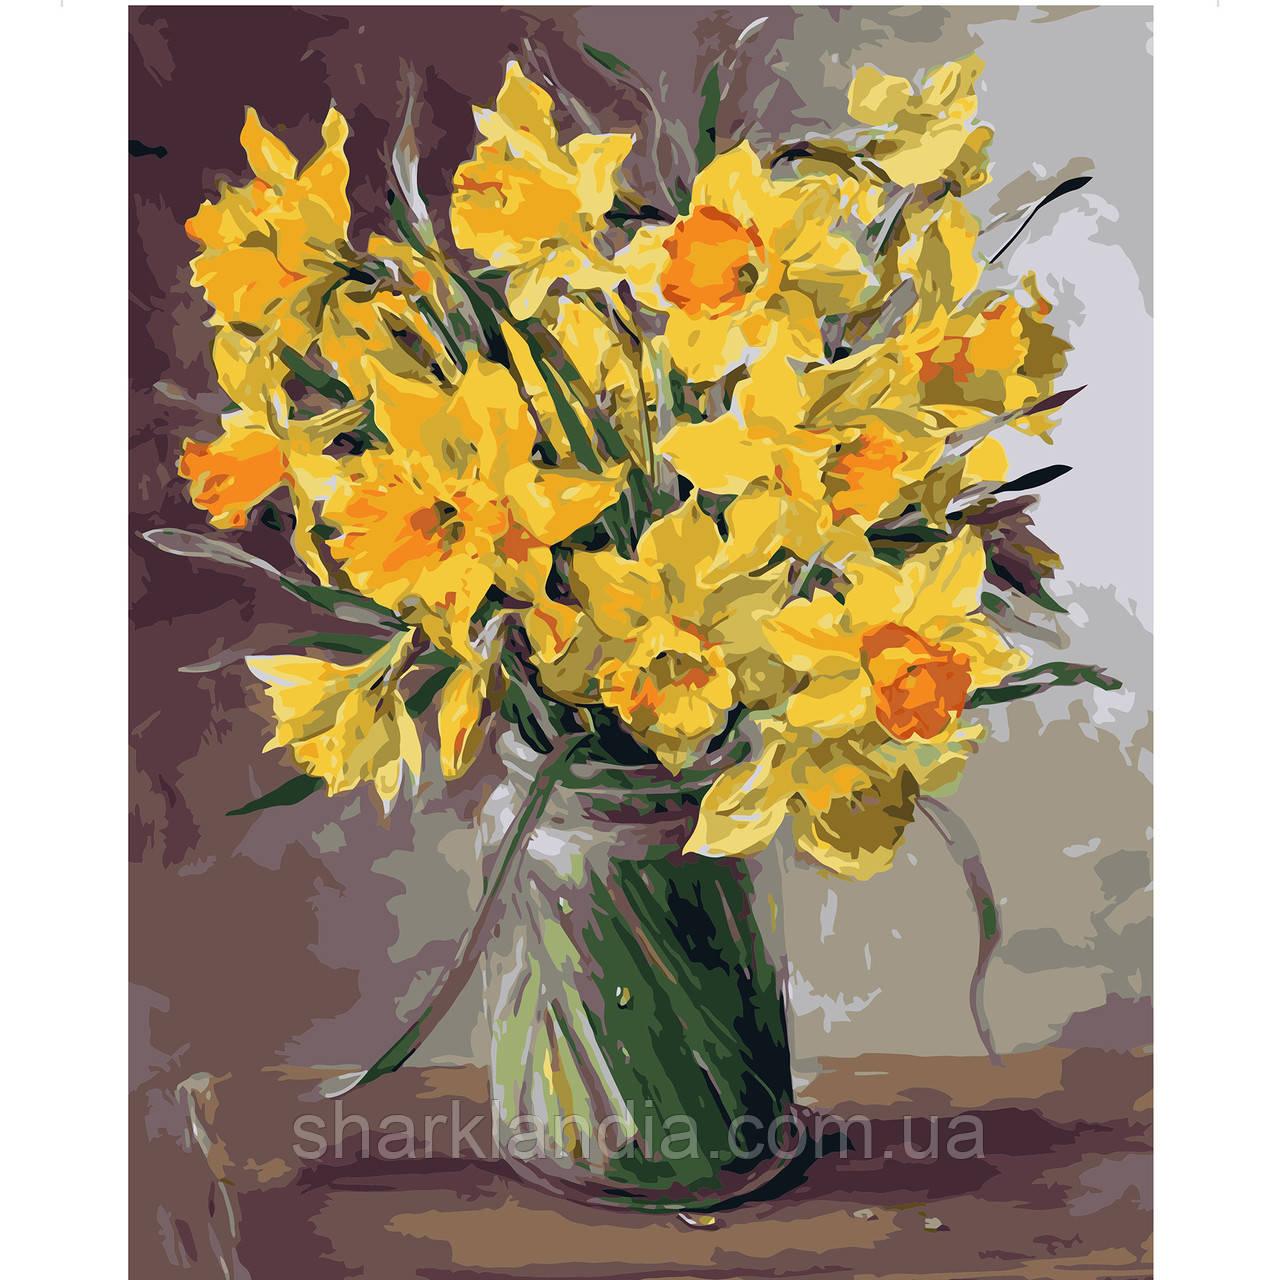 Картина по Номерам Дачный букет желтых нарцисов 40х50см Strateg Цветы